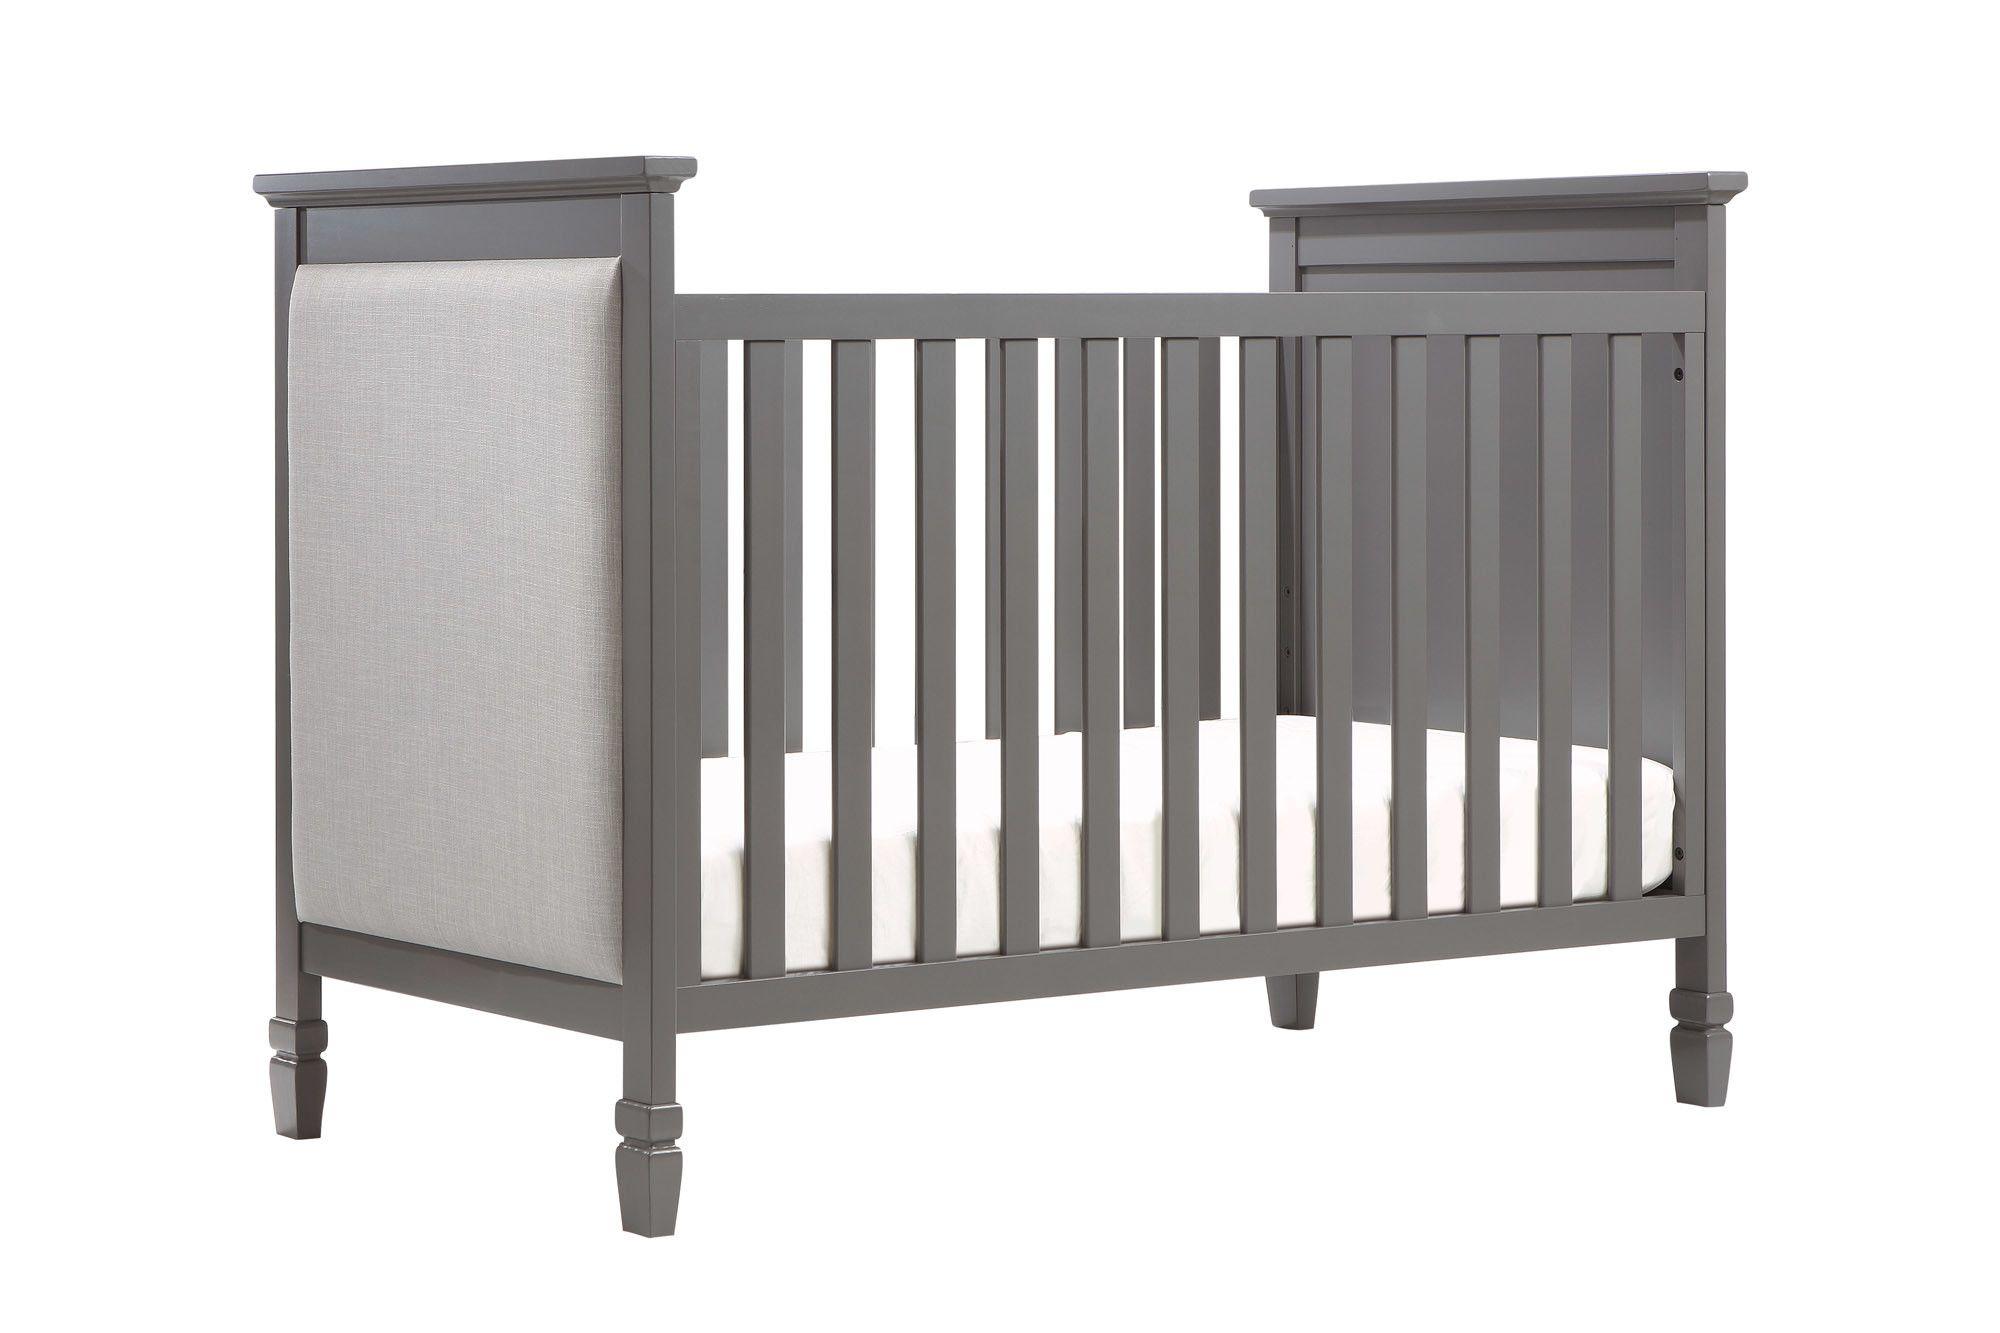 Catarina 3-in-1 Convertible Crib